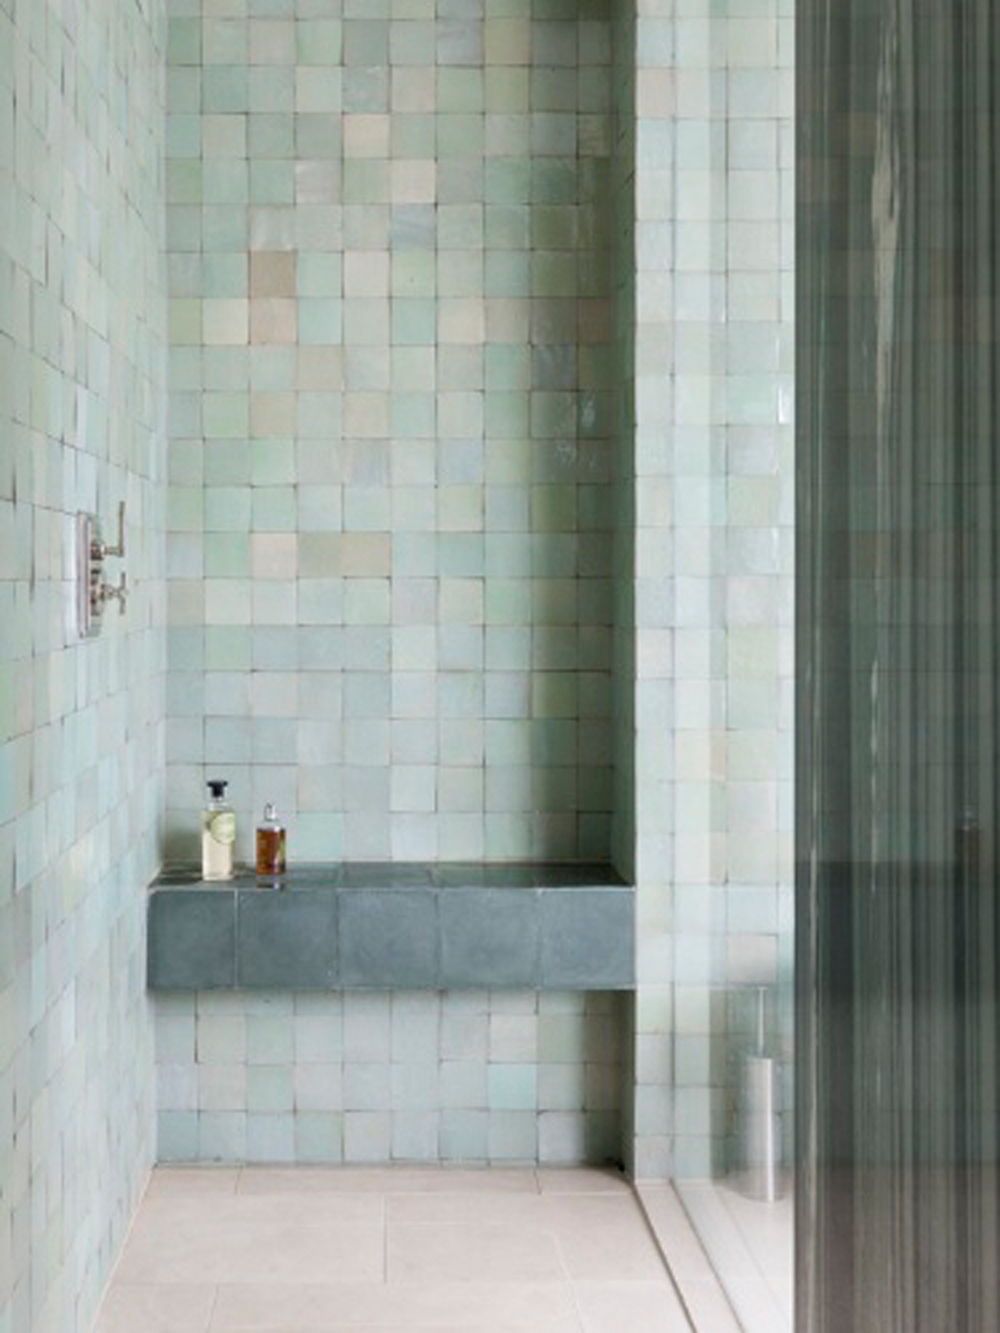 Bathroom renovation tips by First Sense || Eau de nil Zellige tiles create a soothing bathroom